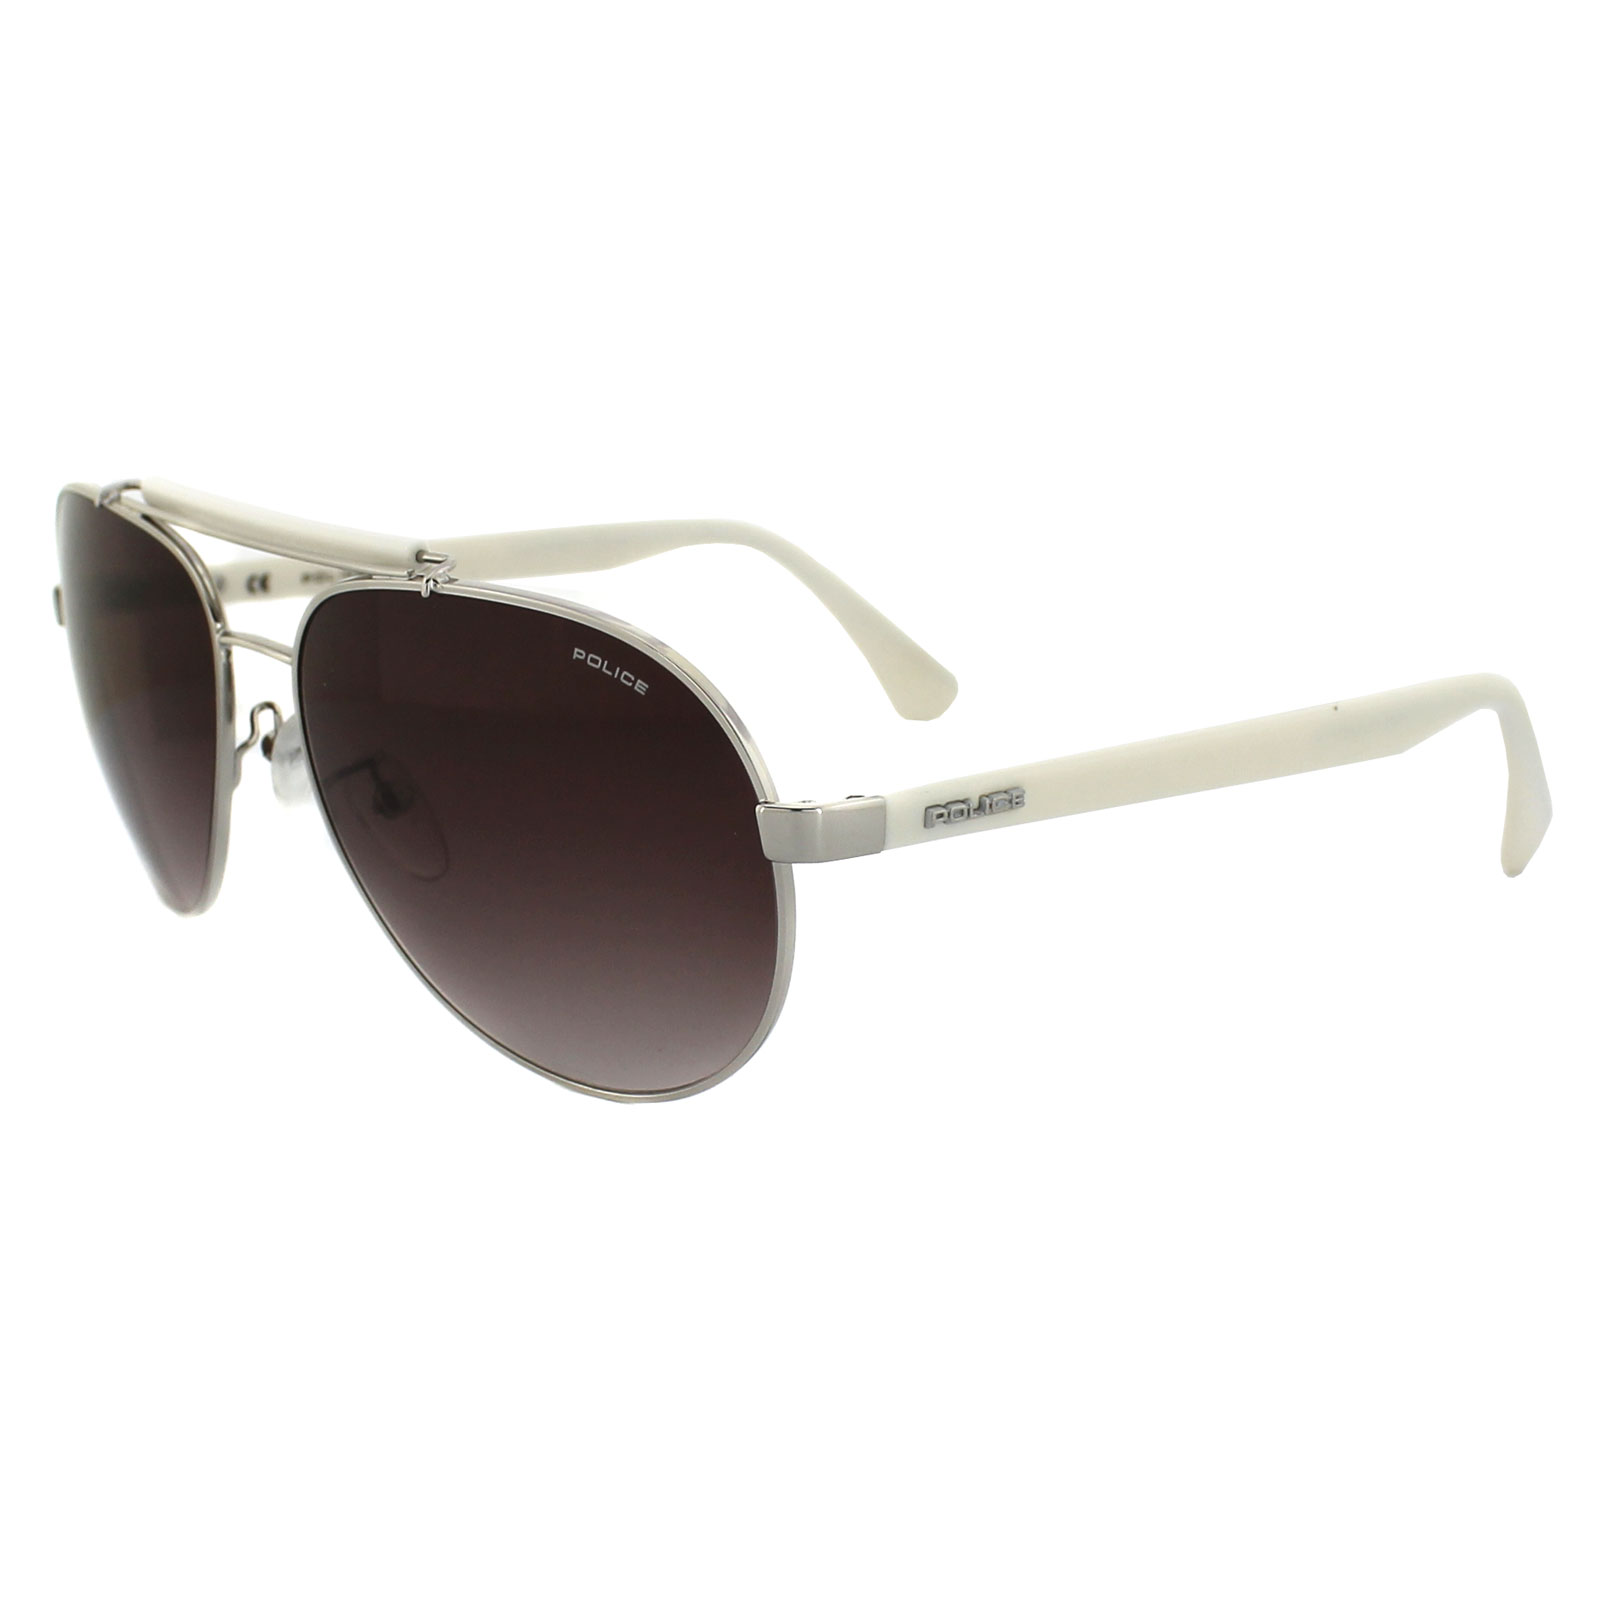 Cheap Police 8644 Sunglasses - Discounted Sunglasses